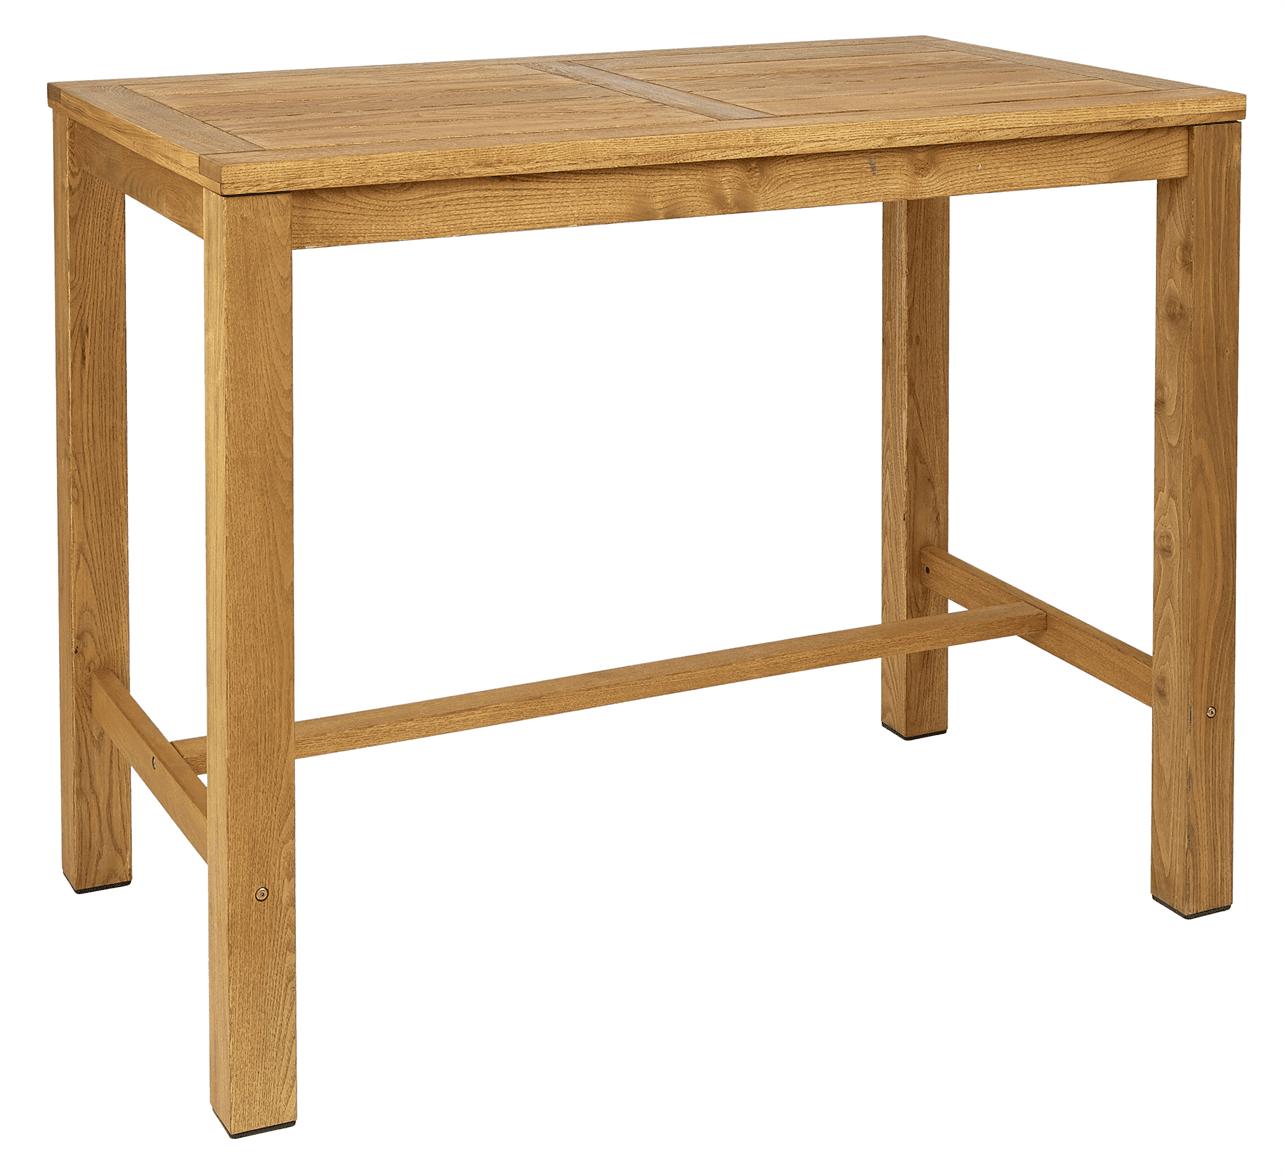 Quad rectangular bar table 1400 x 800mm